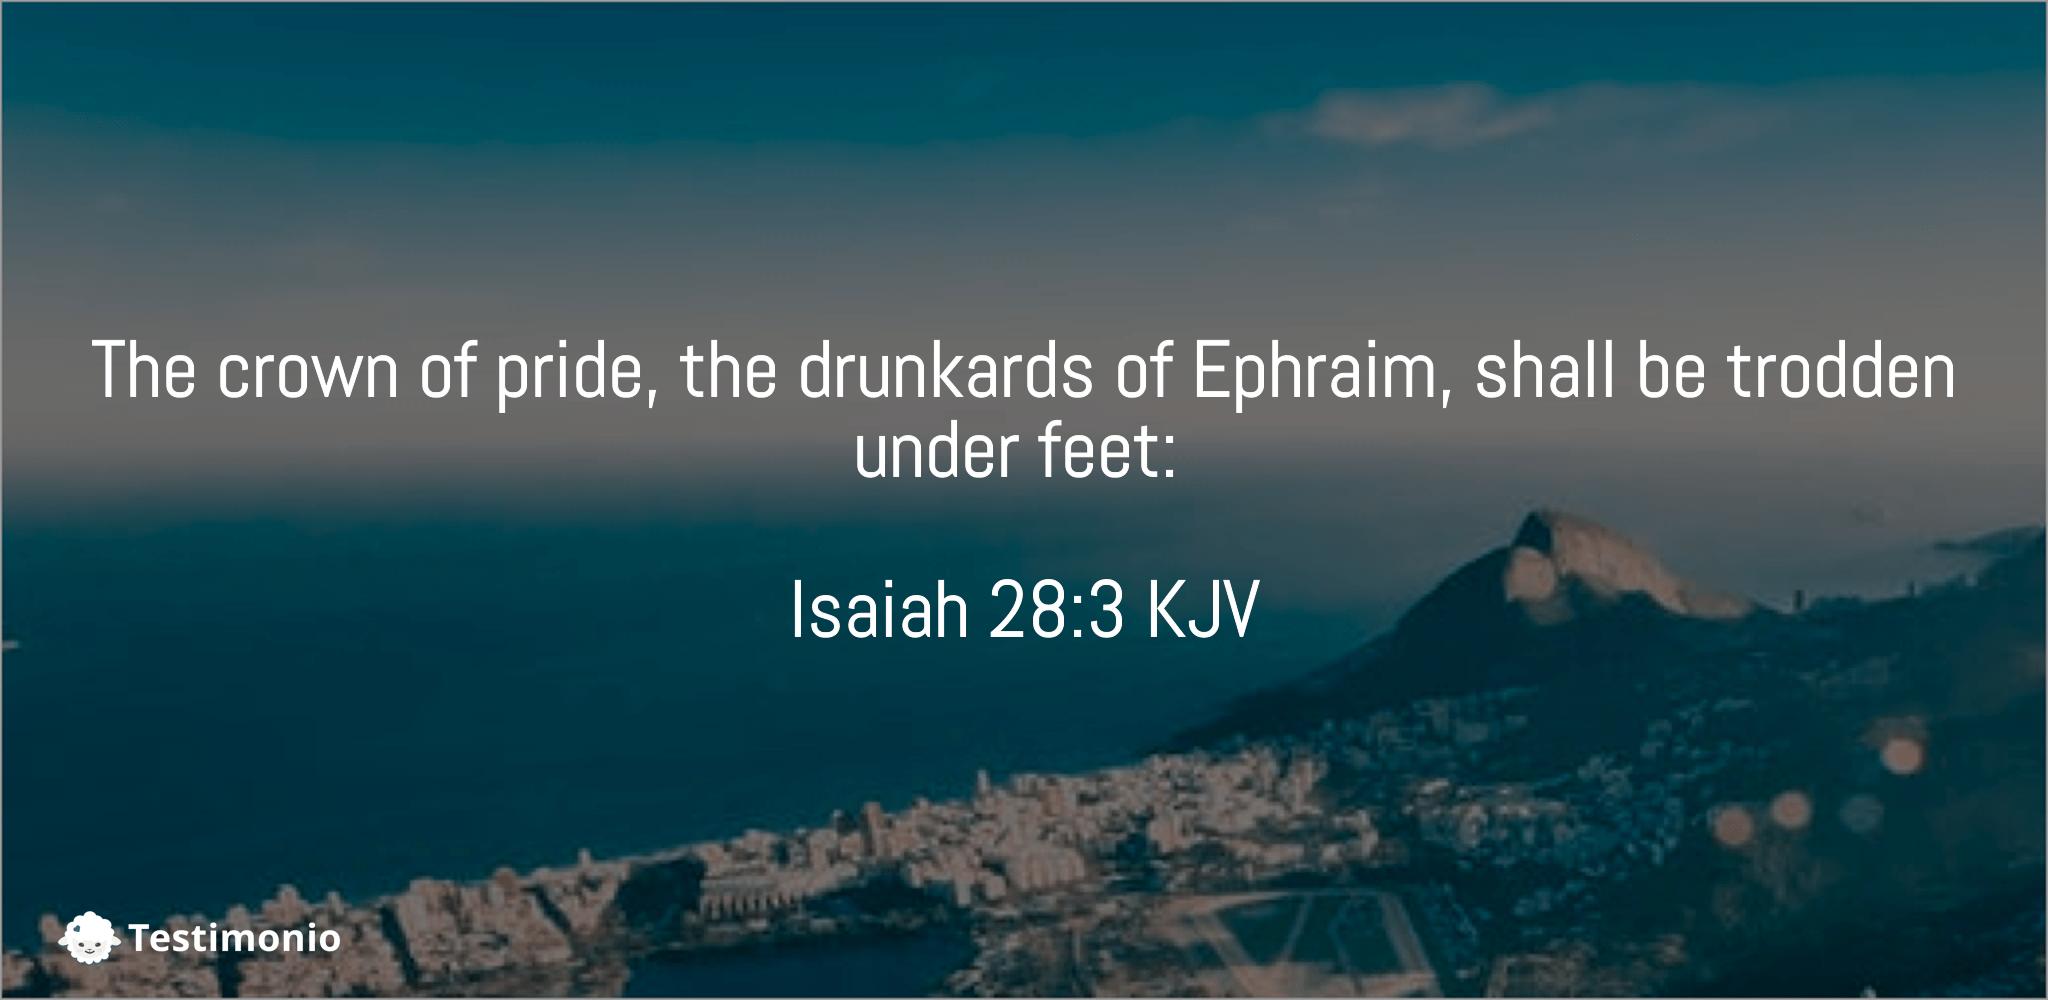 Isaiah 28:3